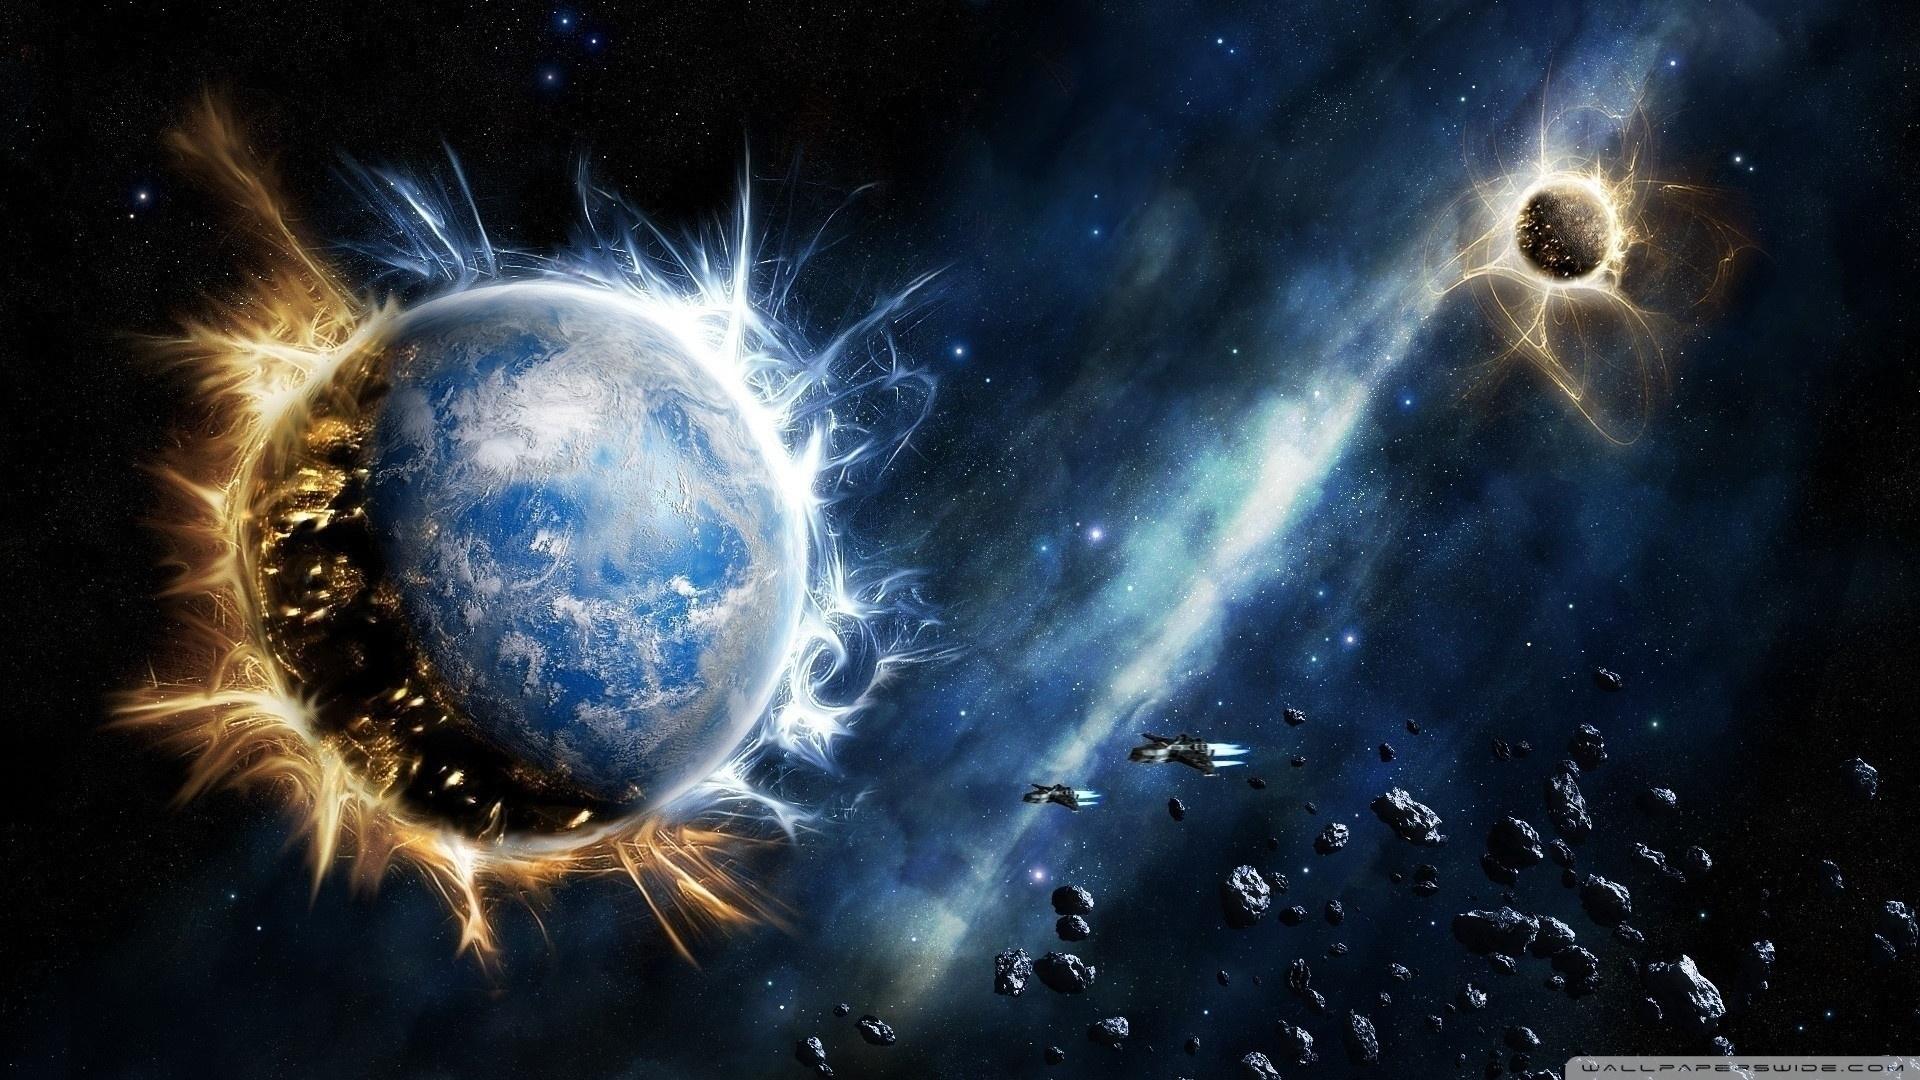 outer space fantasy ❤ 4k hd desktop wallpaper for 4k ultra hd tv